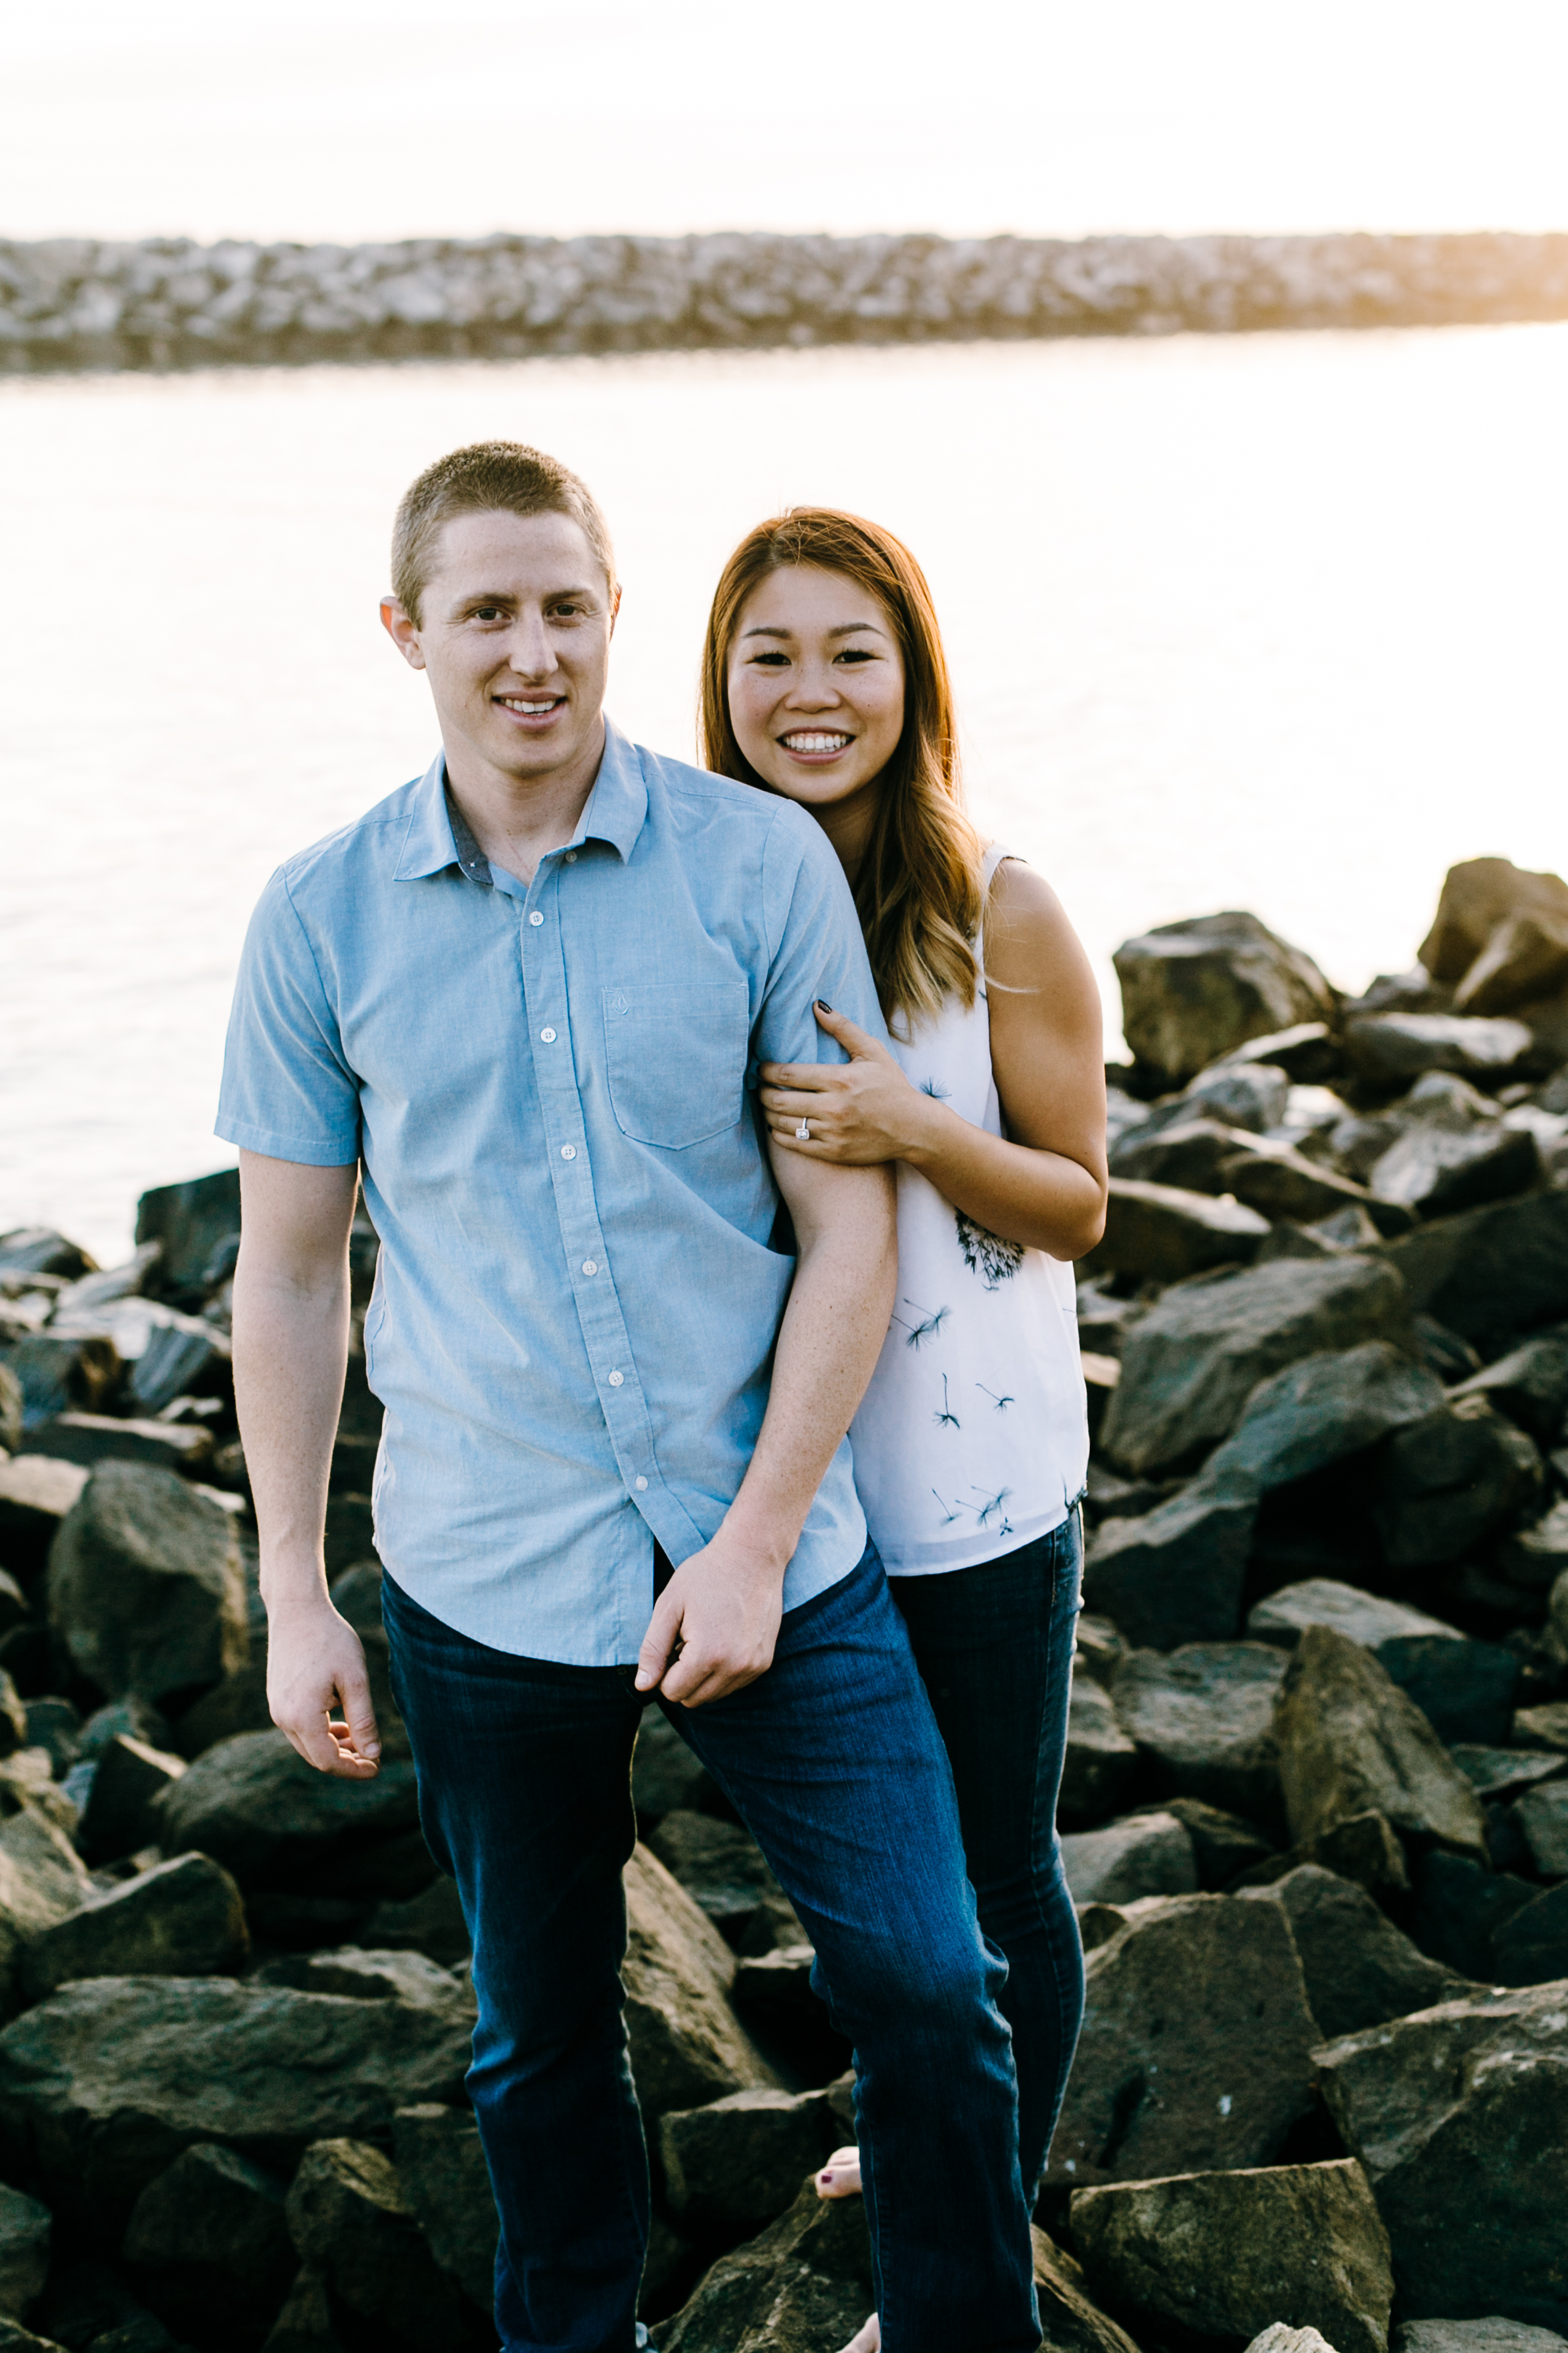 KaraNixonWeddings-DanaPoint-Engagement-22.jpg